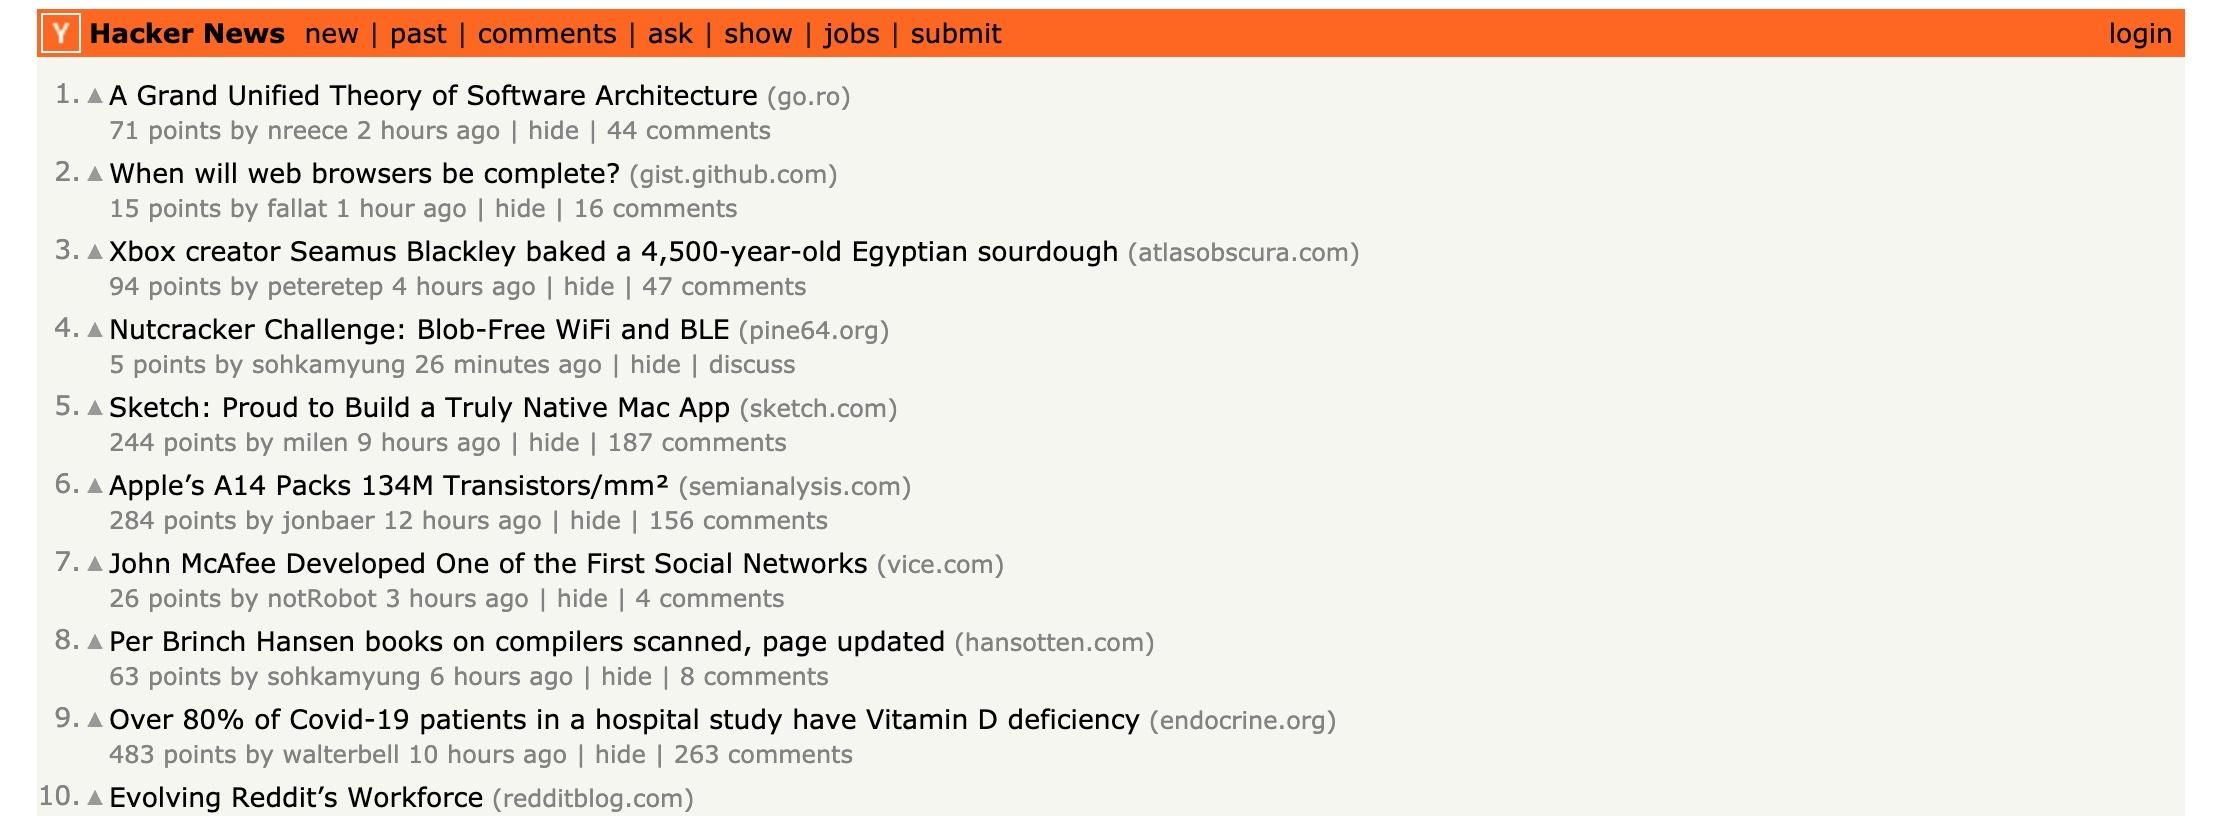 Hacker News的界面设计是出了名的简洁 我甚至没有找到广告的摆放位置